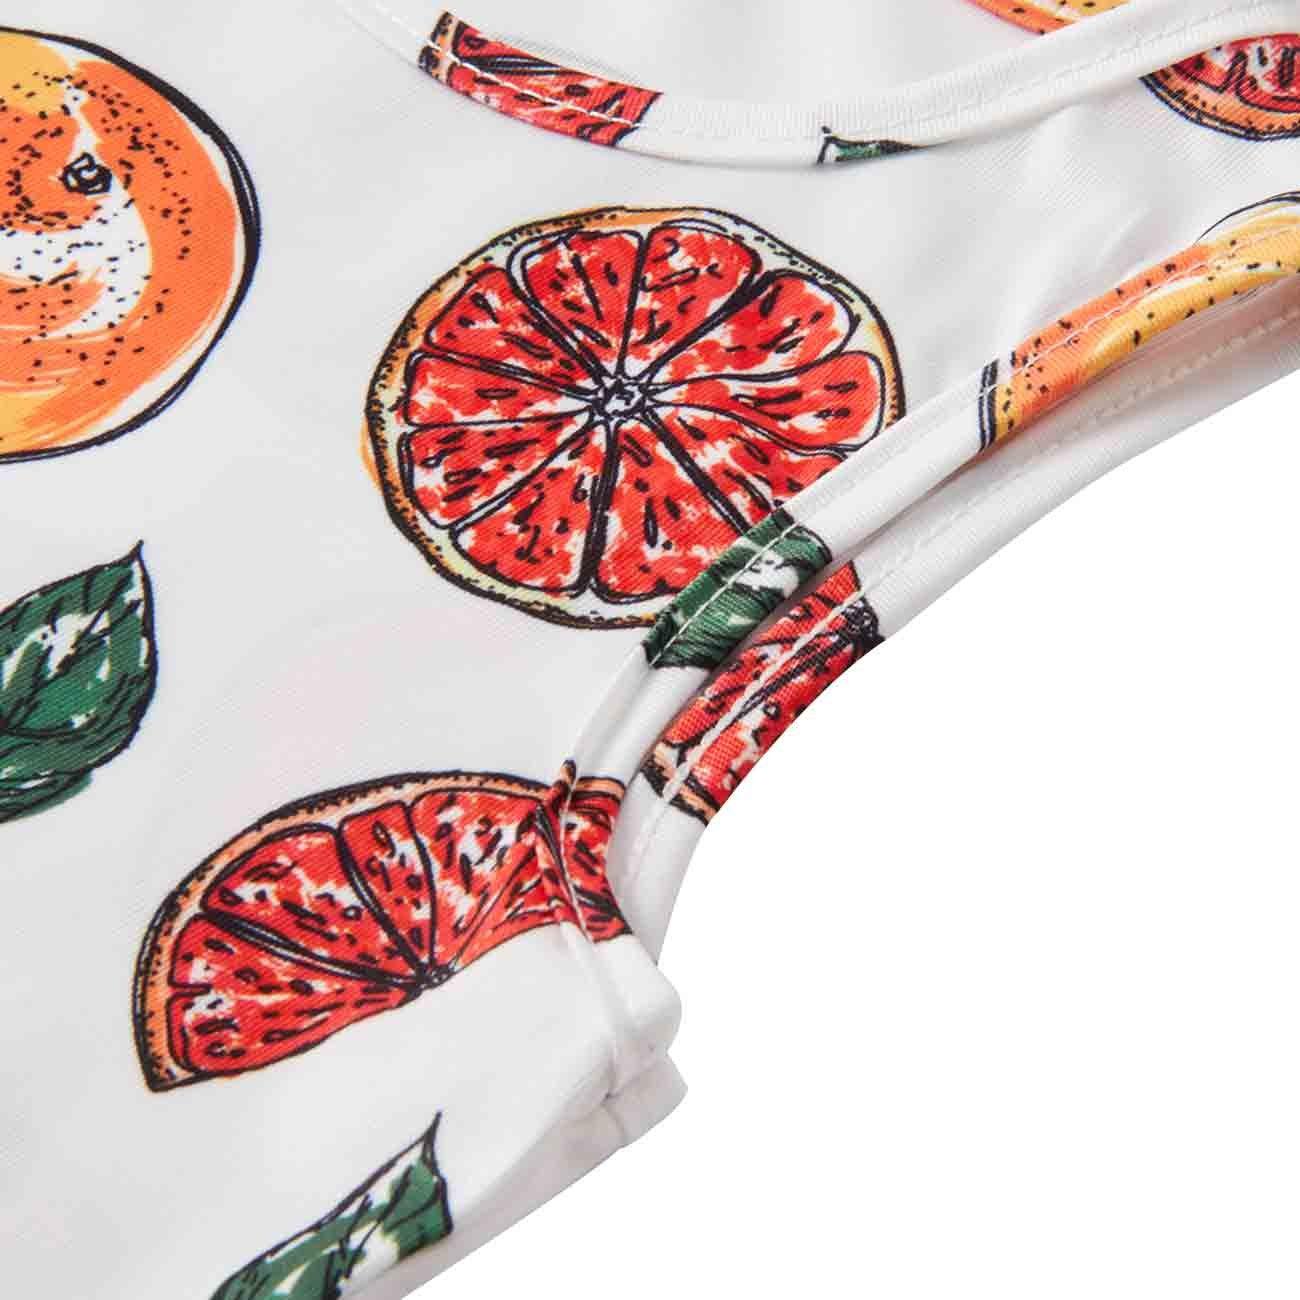 BFUSTYLE Girl Print Dress, Little Girls Round Neck Sleeveless Slim Fit Casual Dresses (S,Orange)